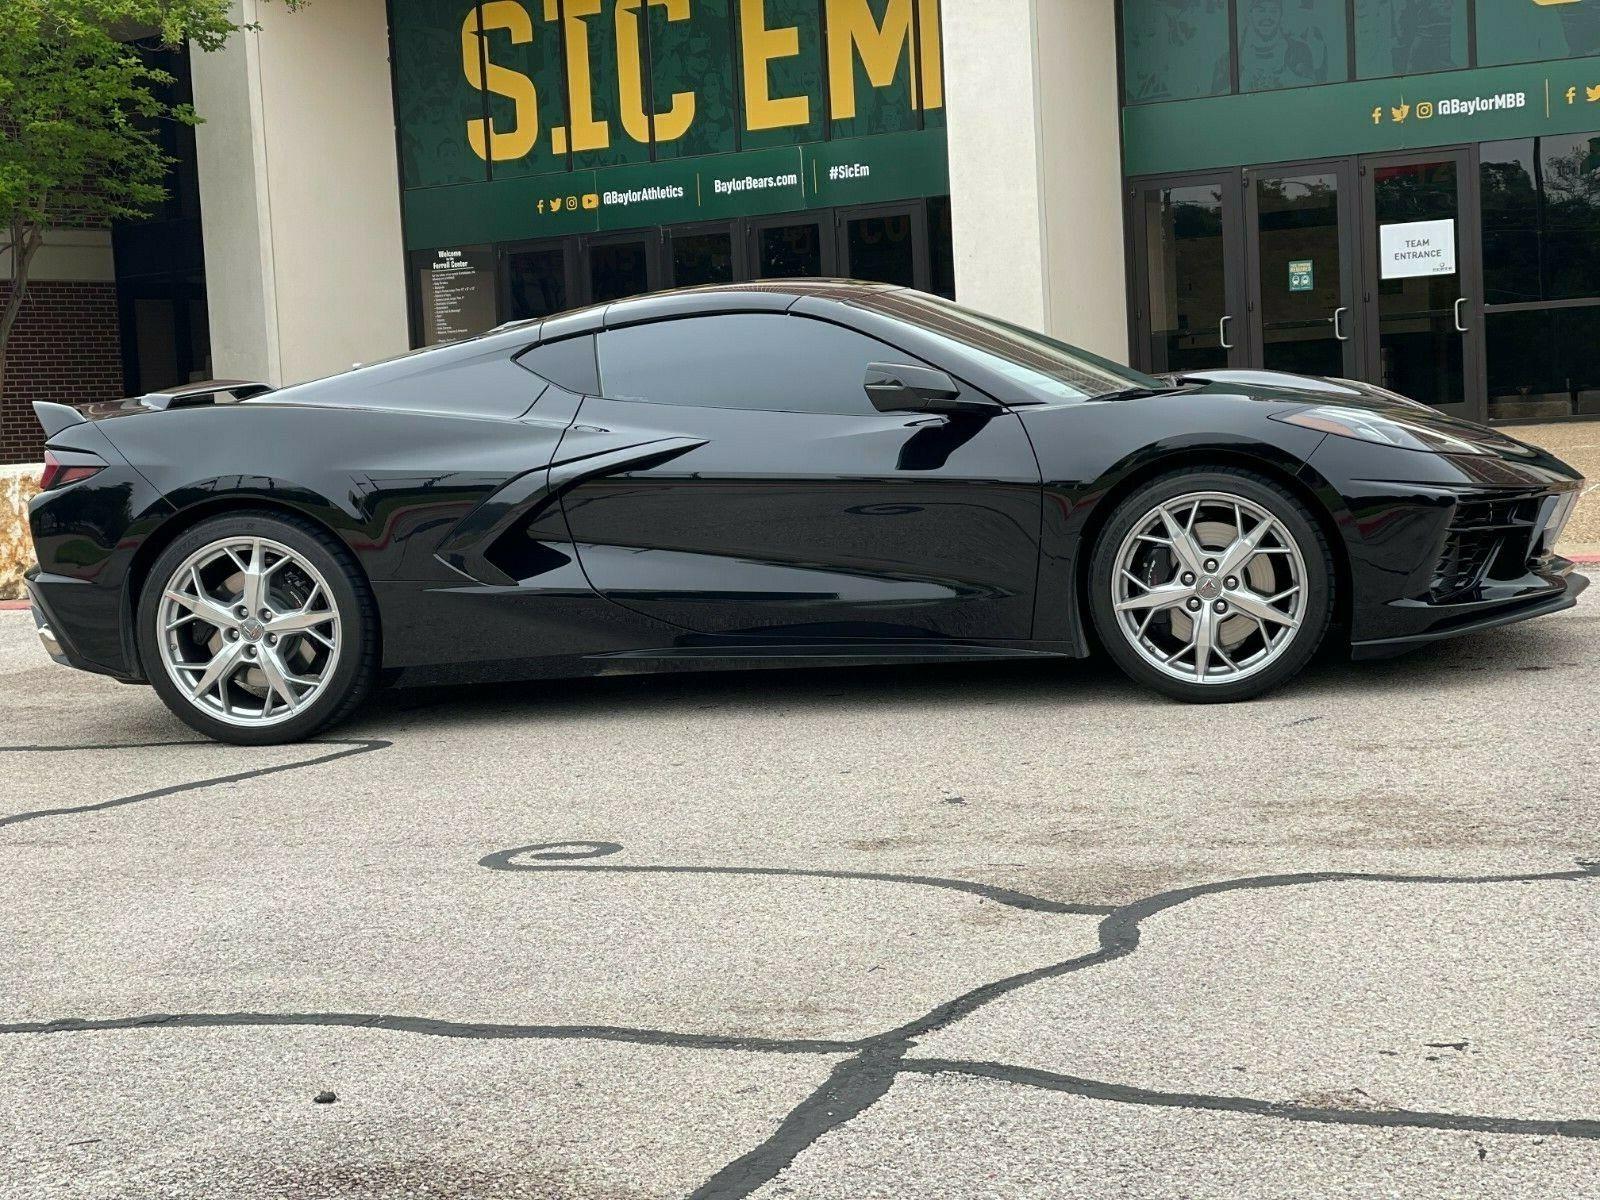 2020 Black Chevrolet Corvette   | C7 Corvette Photo 1